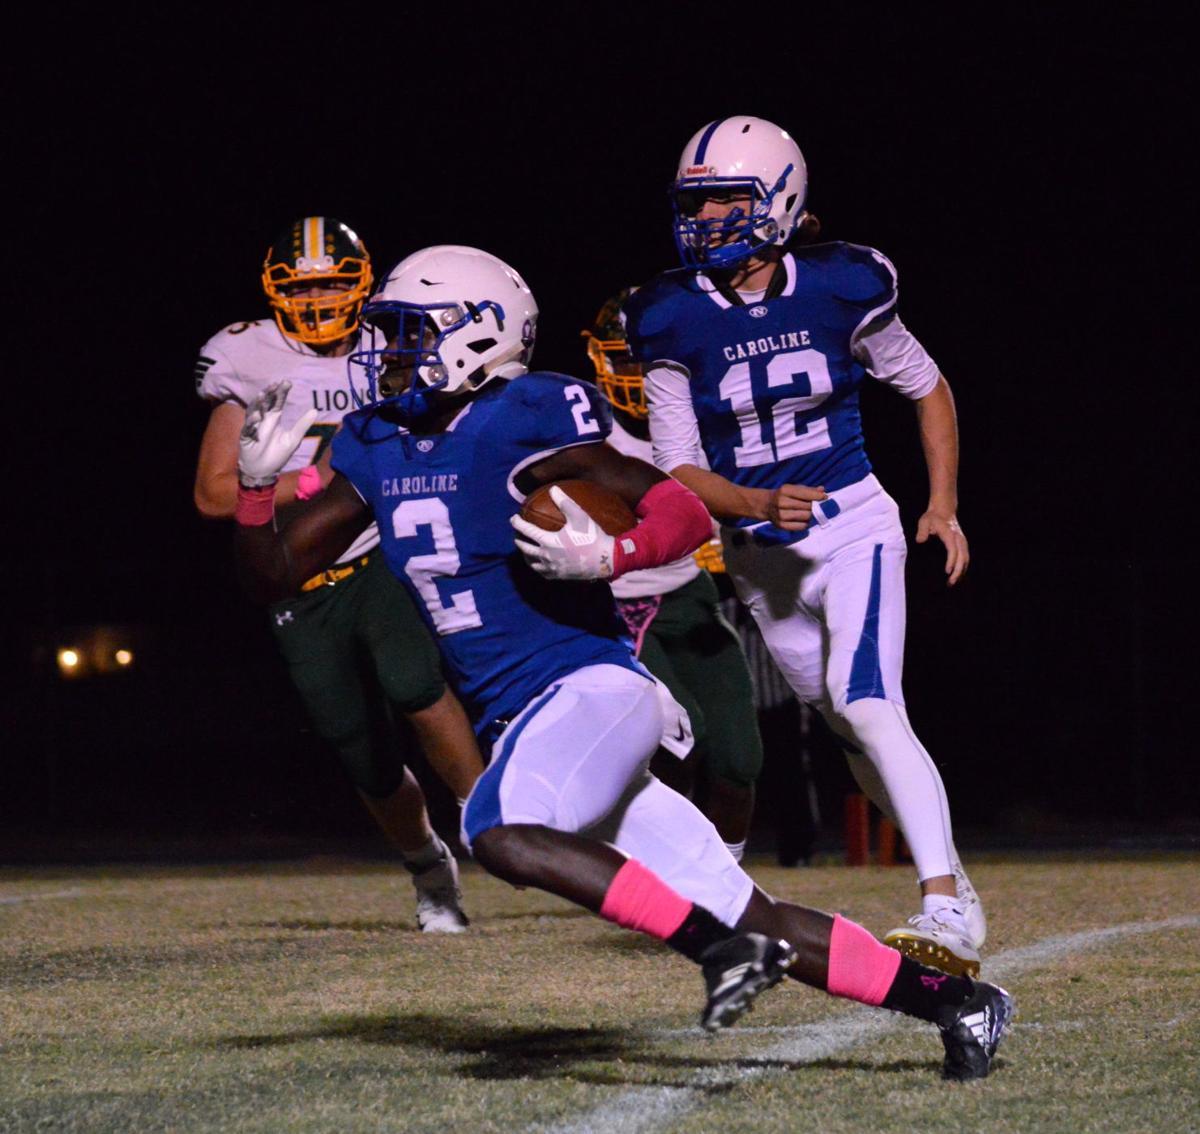 High School Football: Queen Anne's at North Caroline